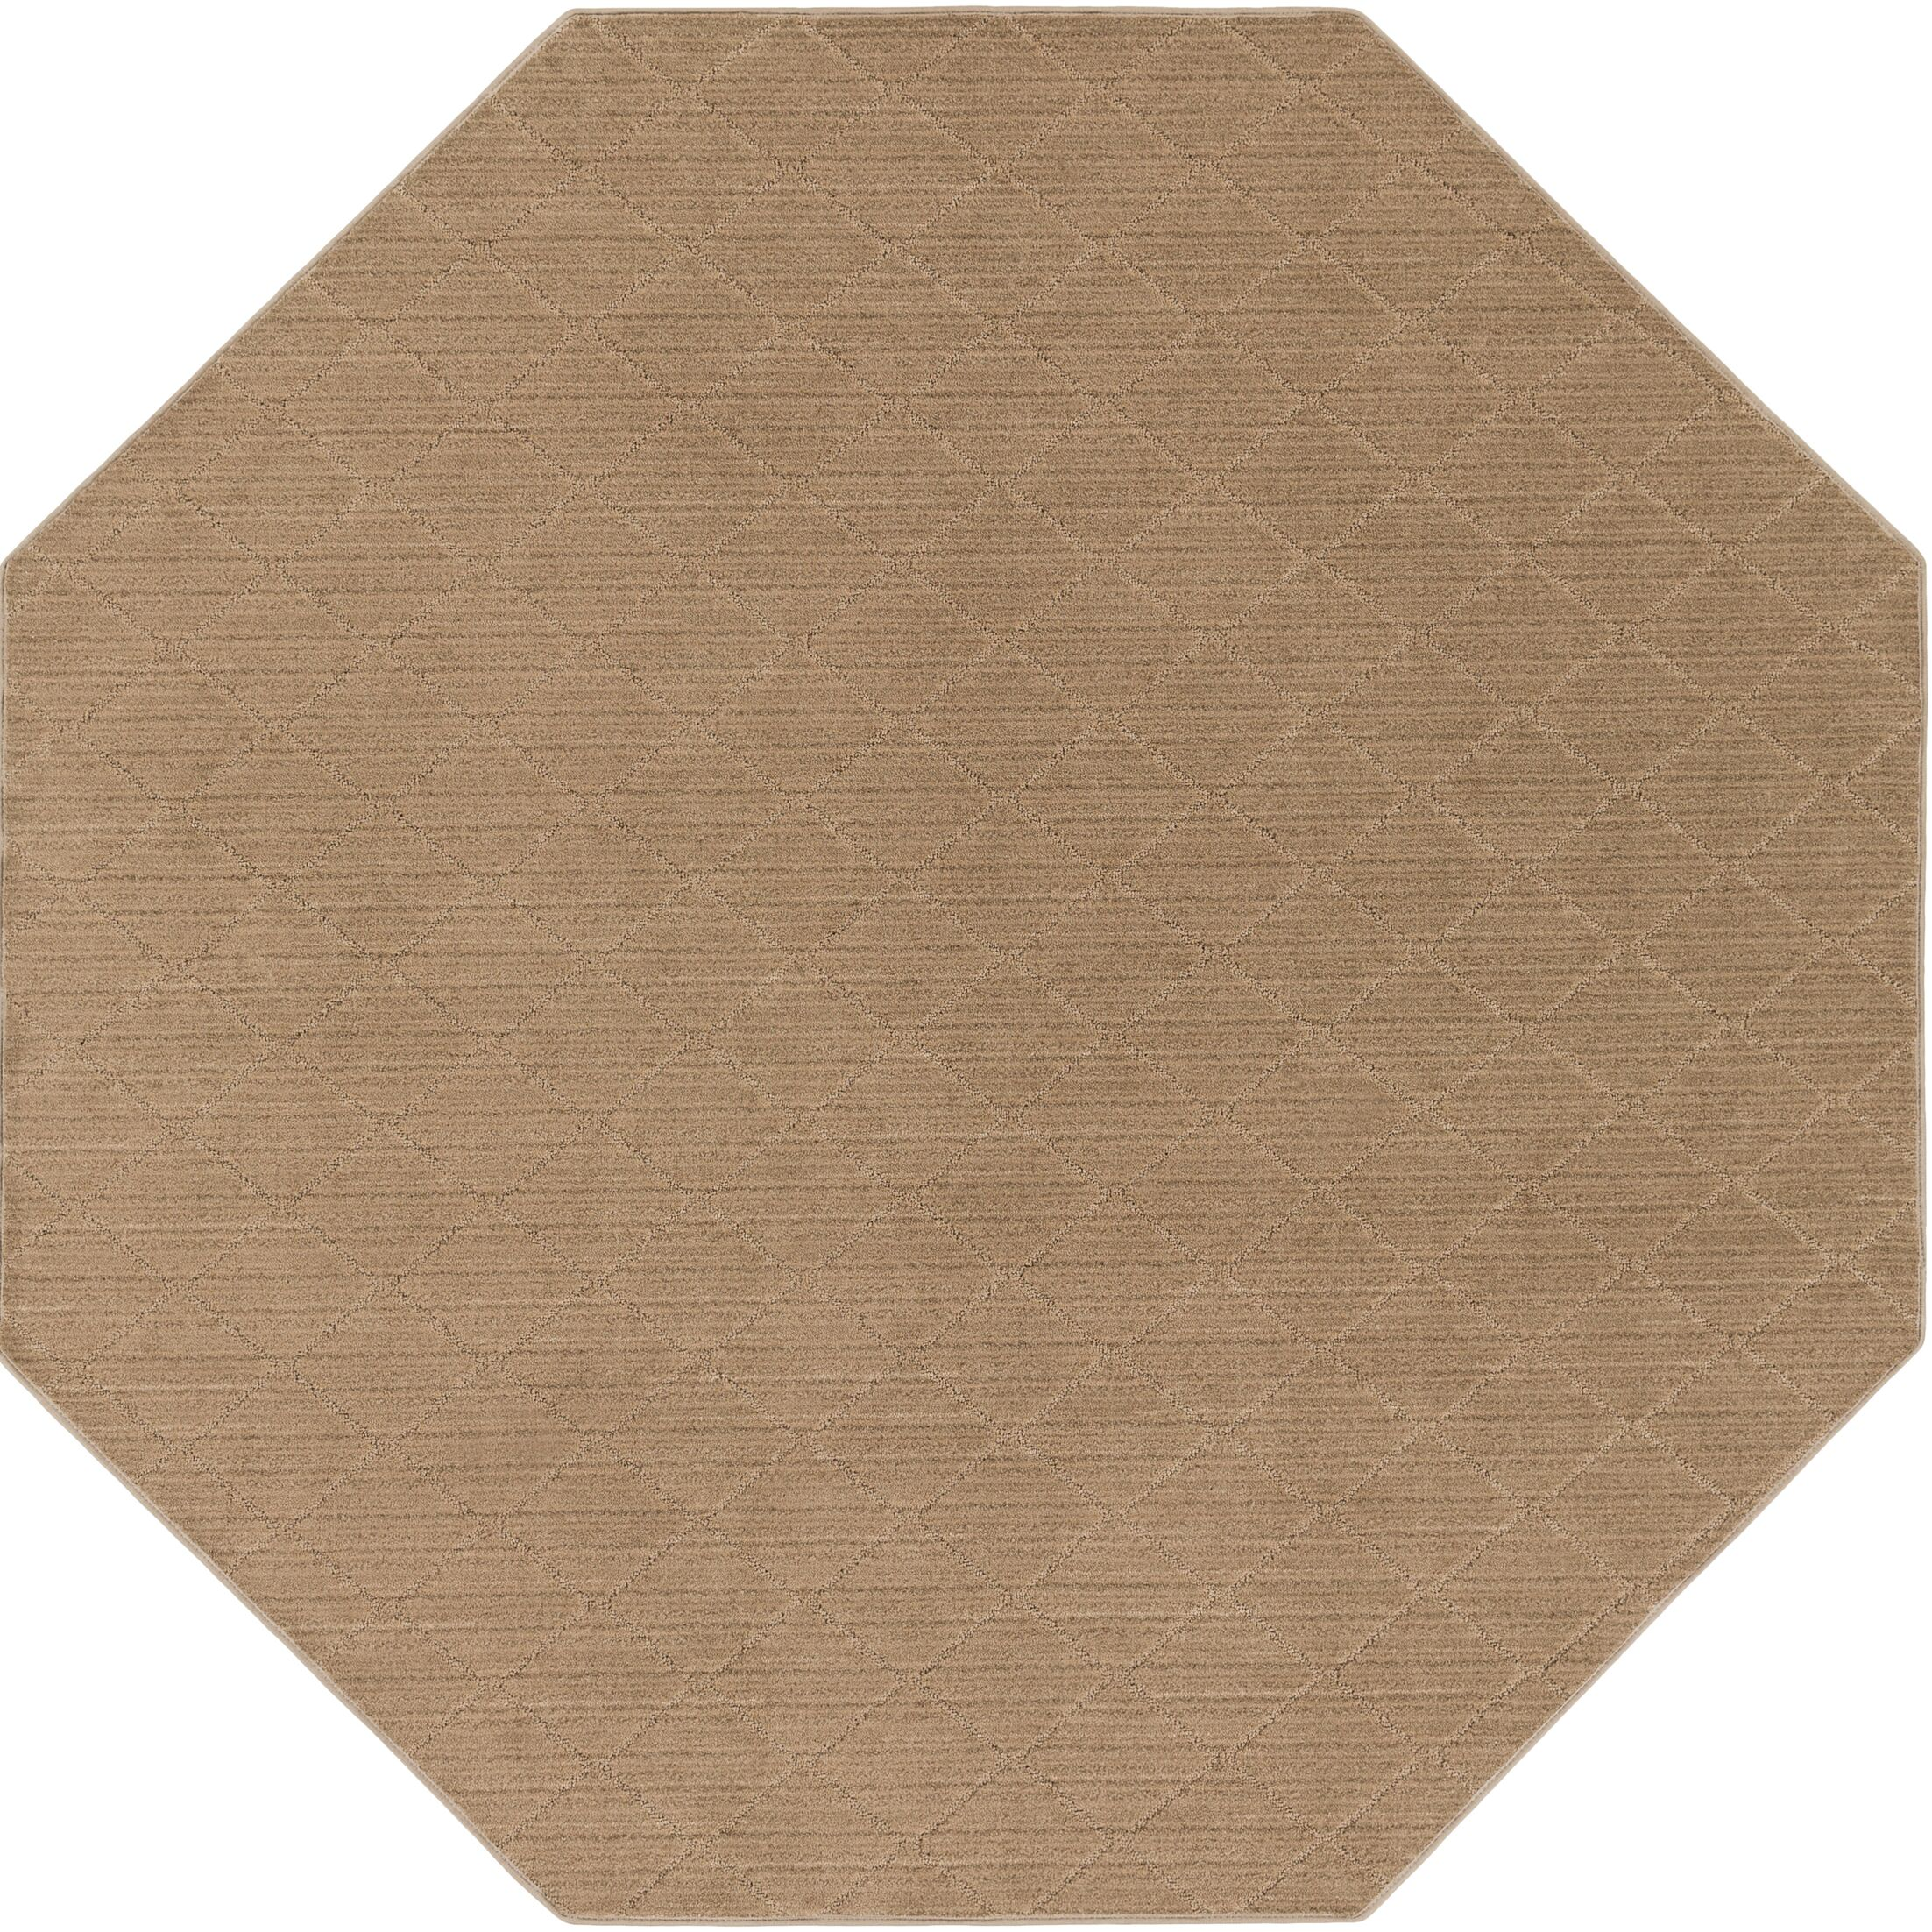 Huxley Beige Area Rug Rug Size: Octagon 6'